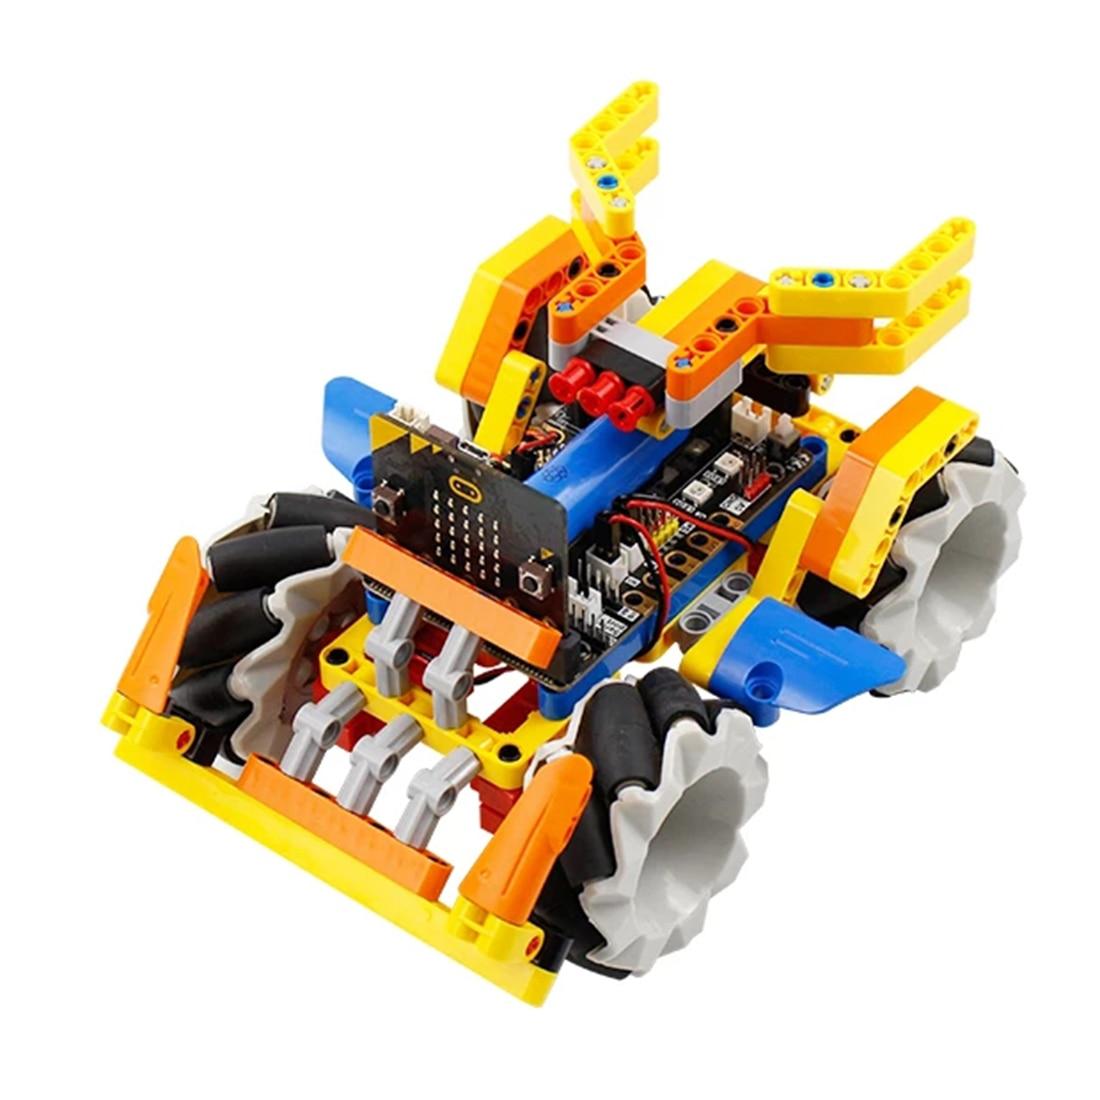 Program Intelligent Robot Building Block Kit Mecanum Wheel Robot Car For Micro: Bit  Programmable Toys For Kids Adults Gift